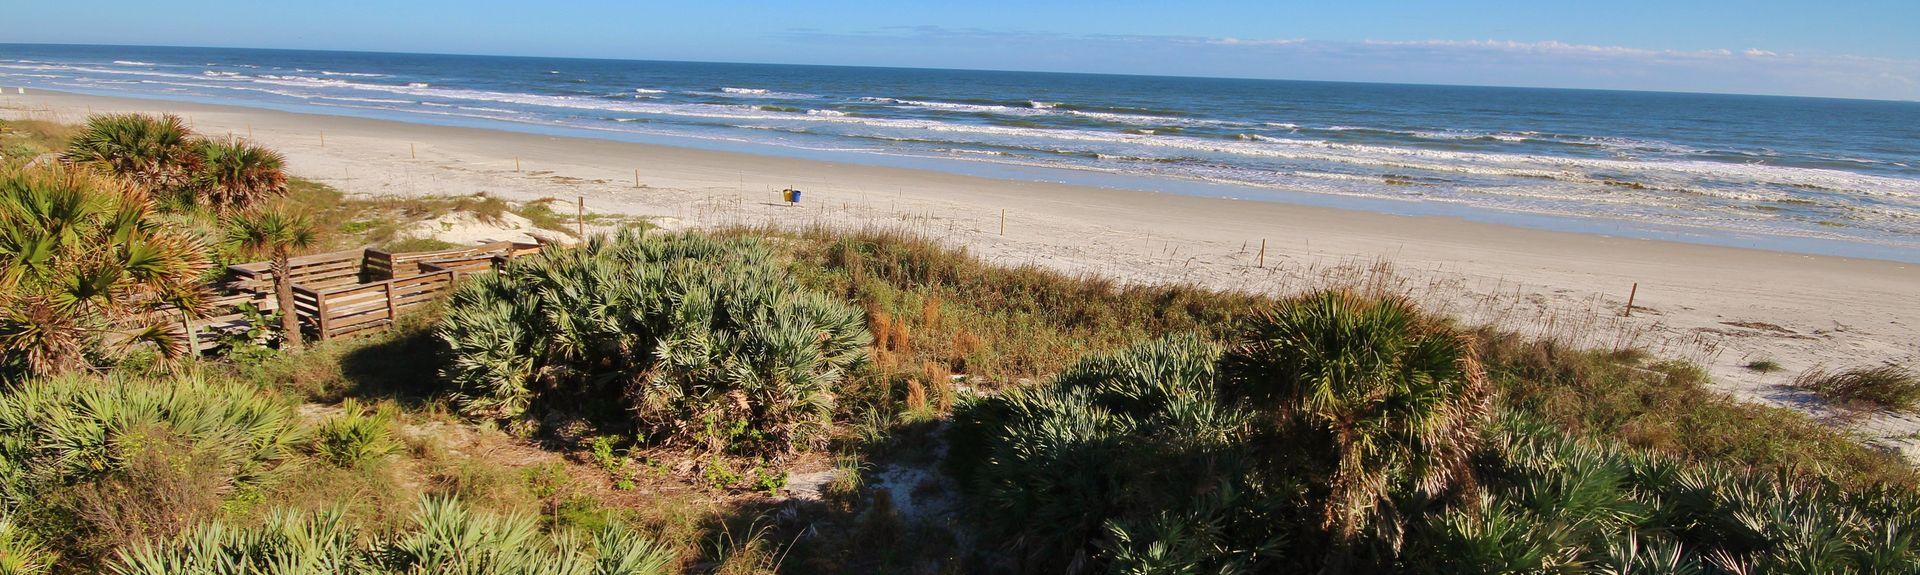 Bethune Volusia Beach, FL, USA